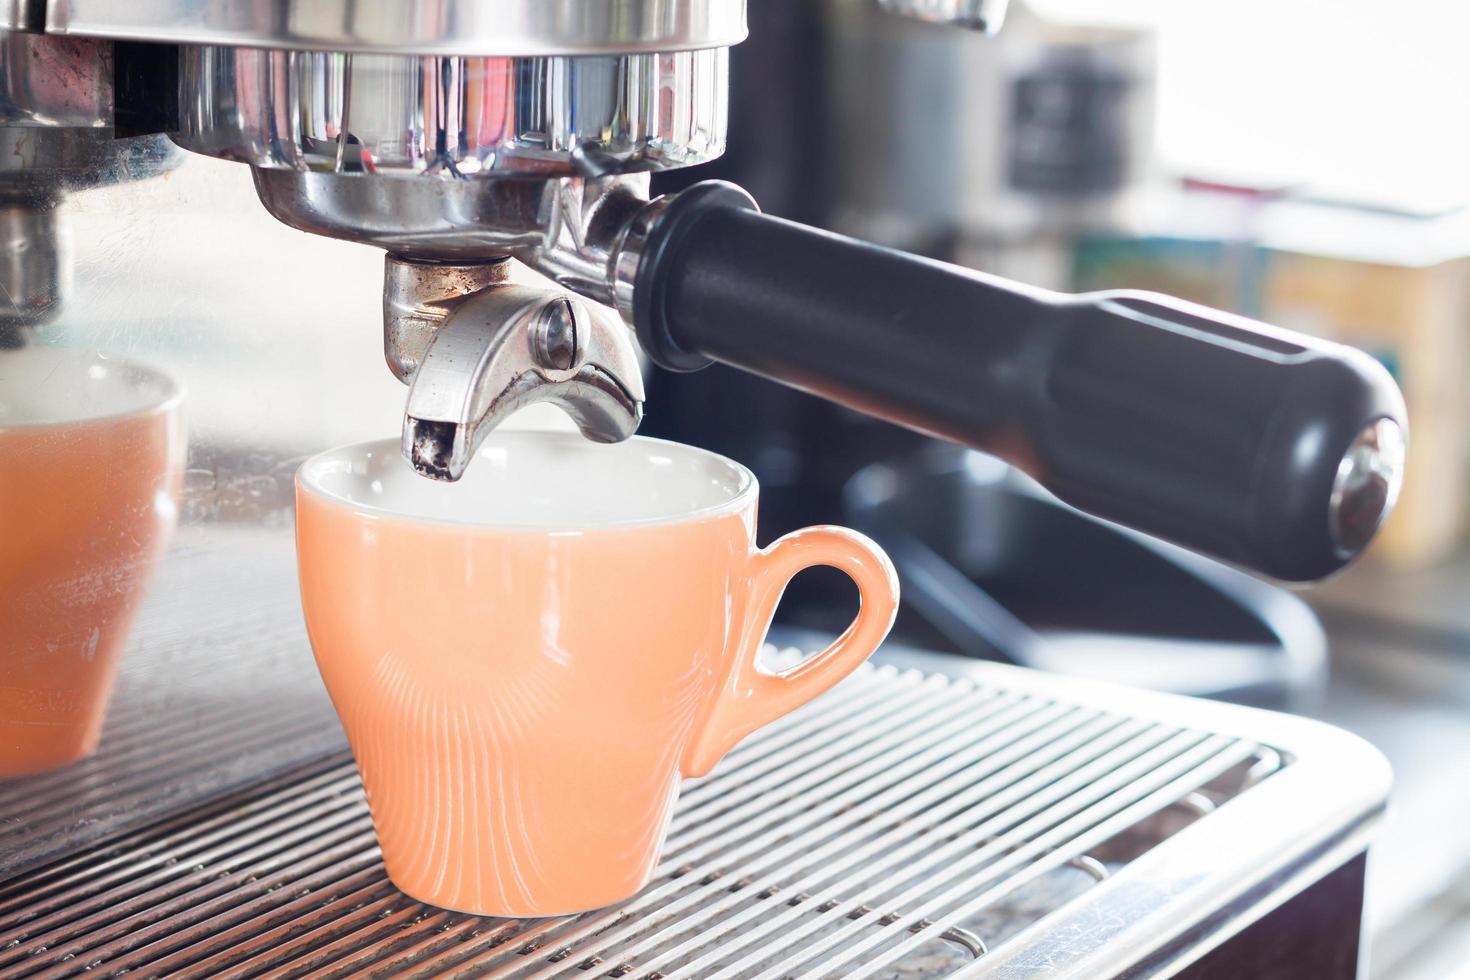 Close-up of an espresso machine photo